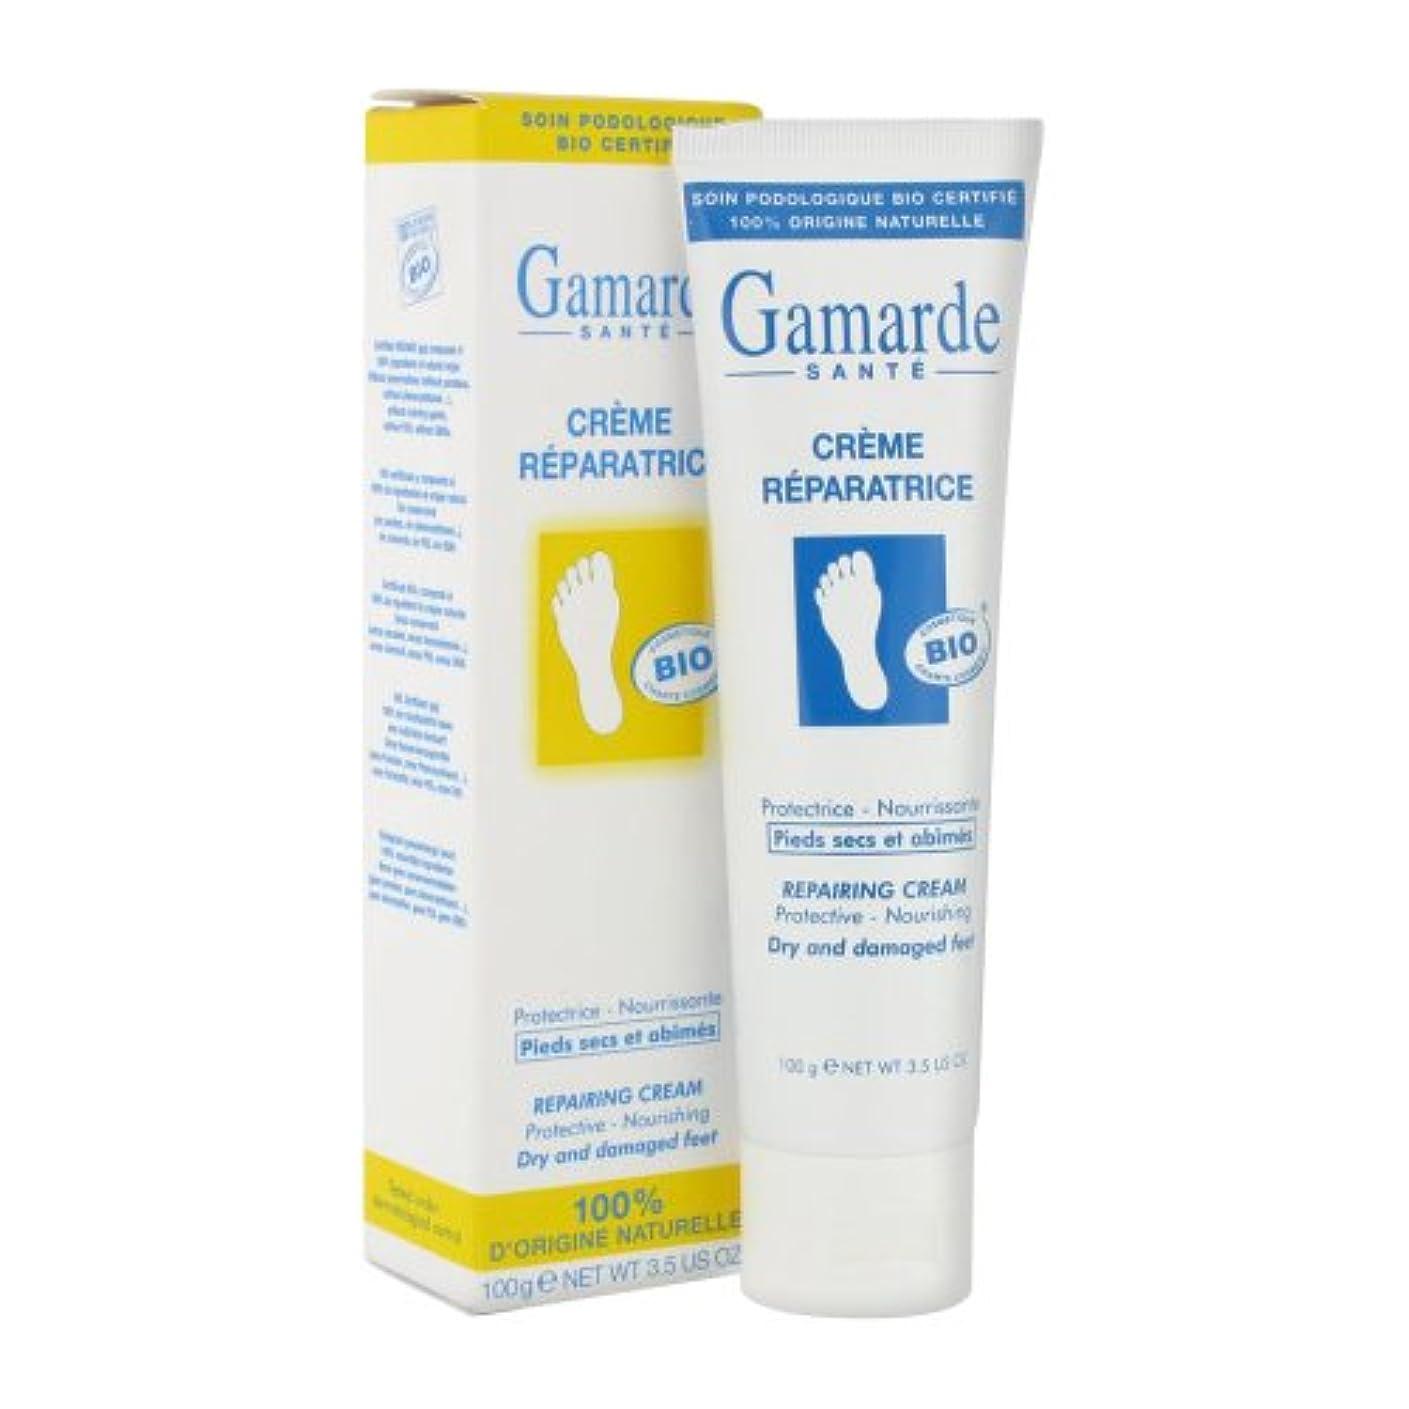 GamARde クレーム レパラトリス 100g (フットクリーム)